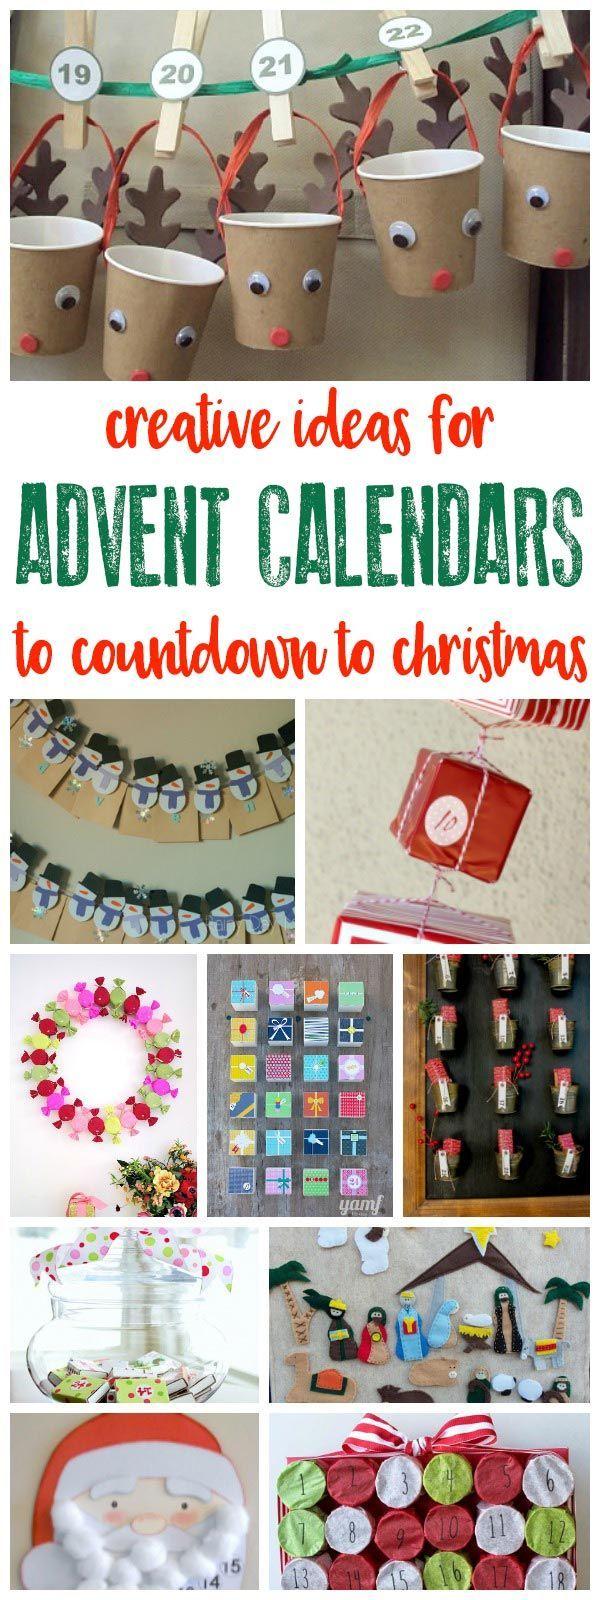 More than 30 creative ideas for making advent calendars